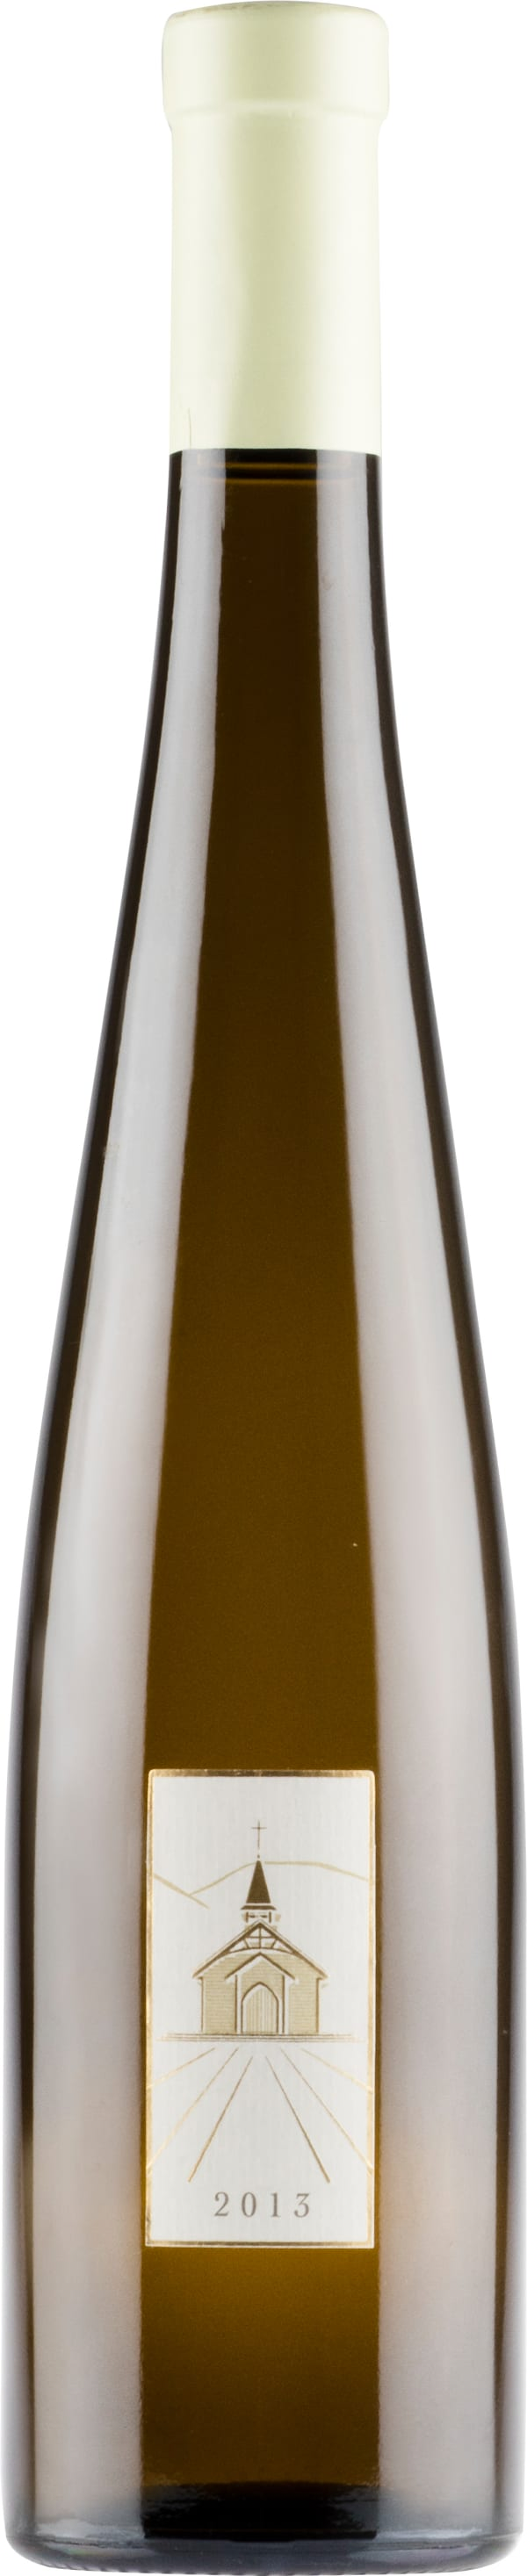 Clos Henri Patience Late Harvest Sauvignon Blanc 2013